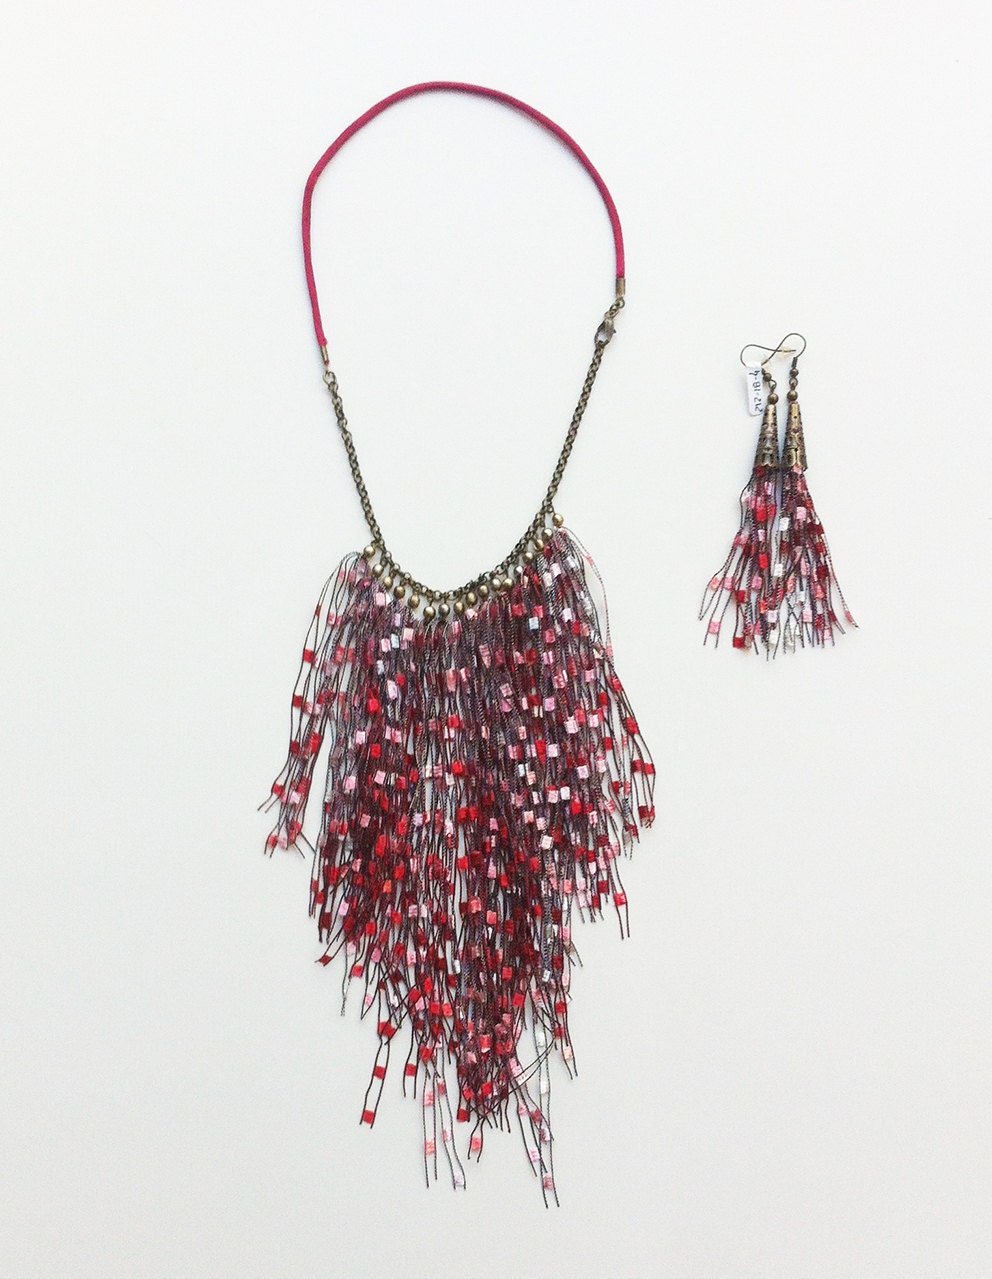 Tassel bib necklace - Tribal necklace- fabric tassel necklace ...